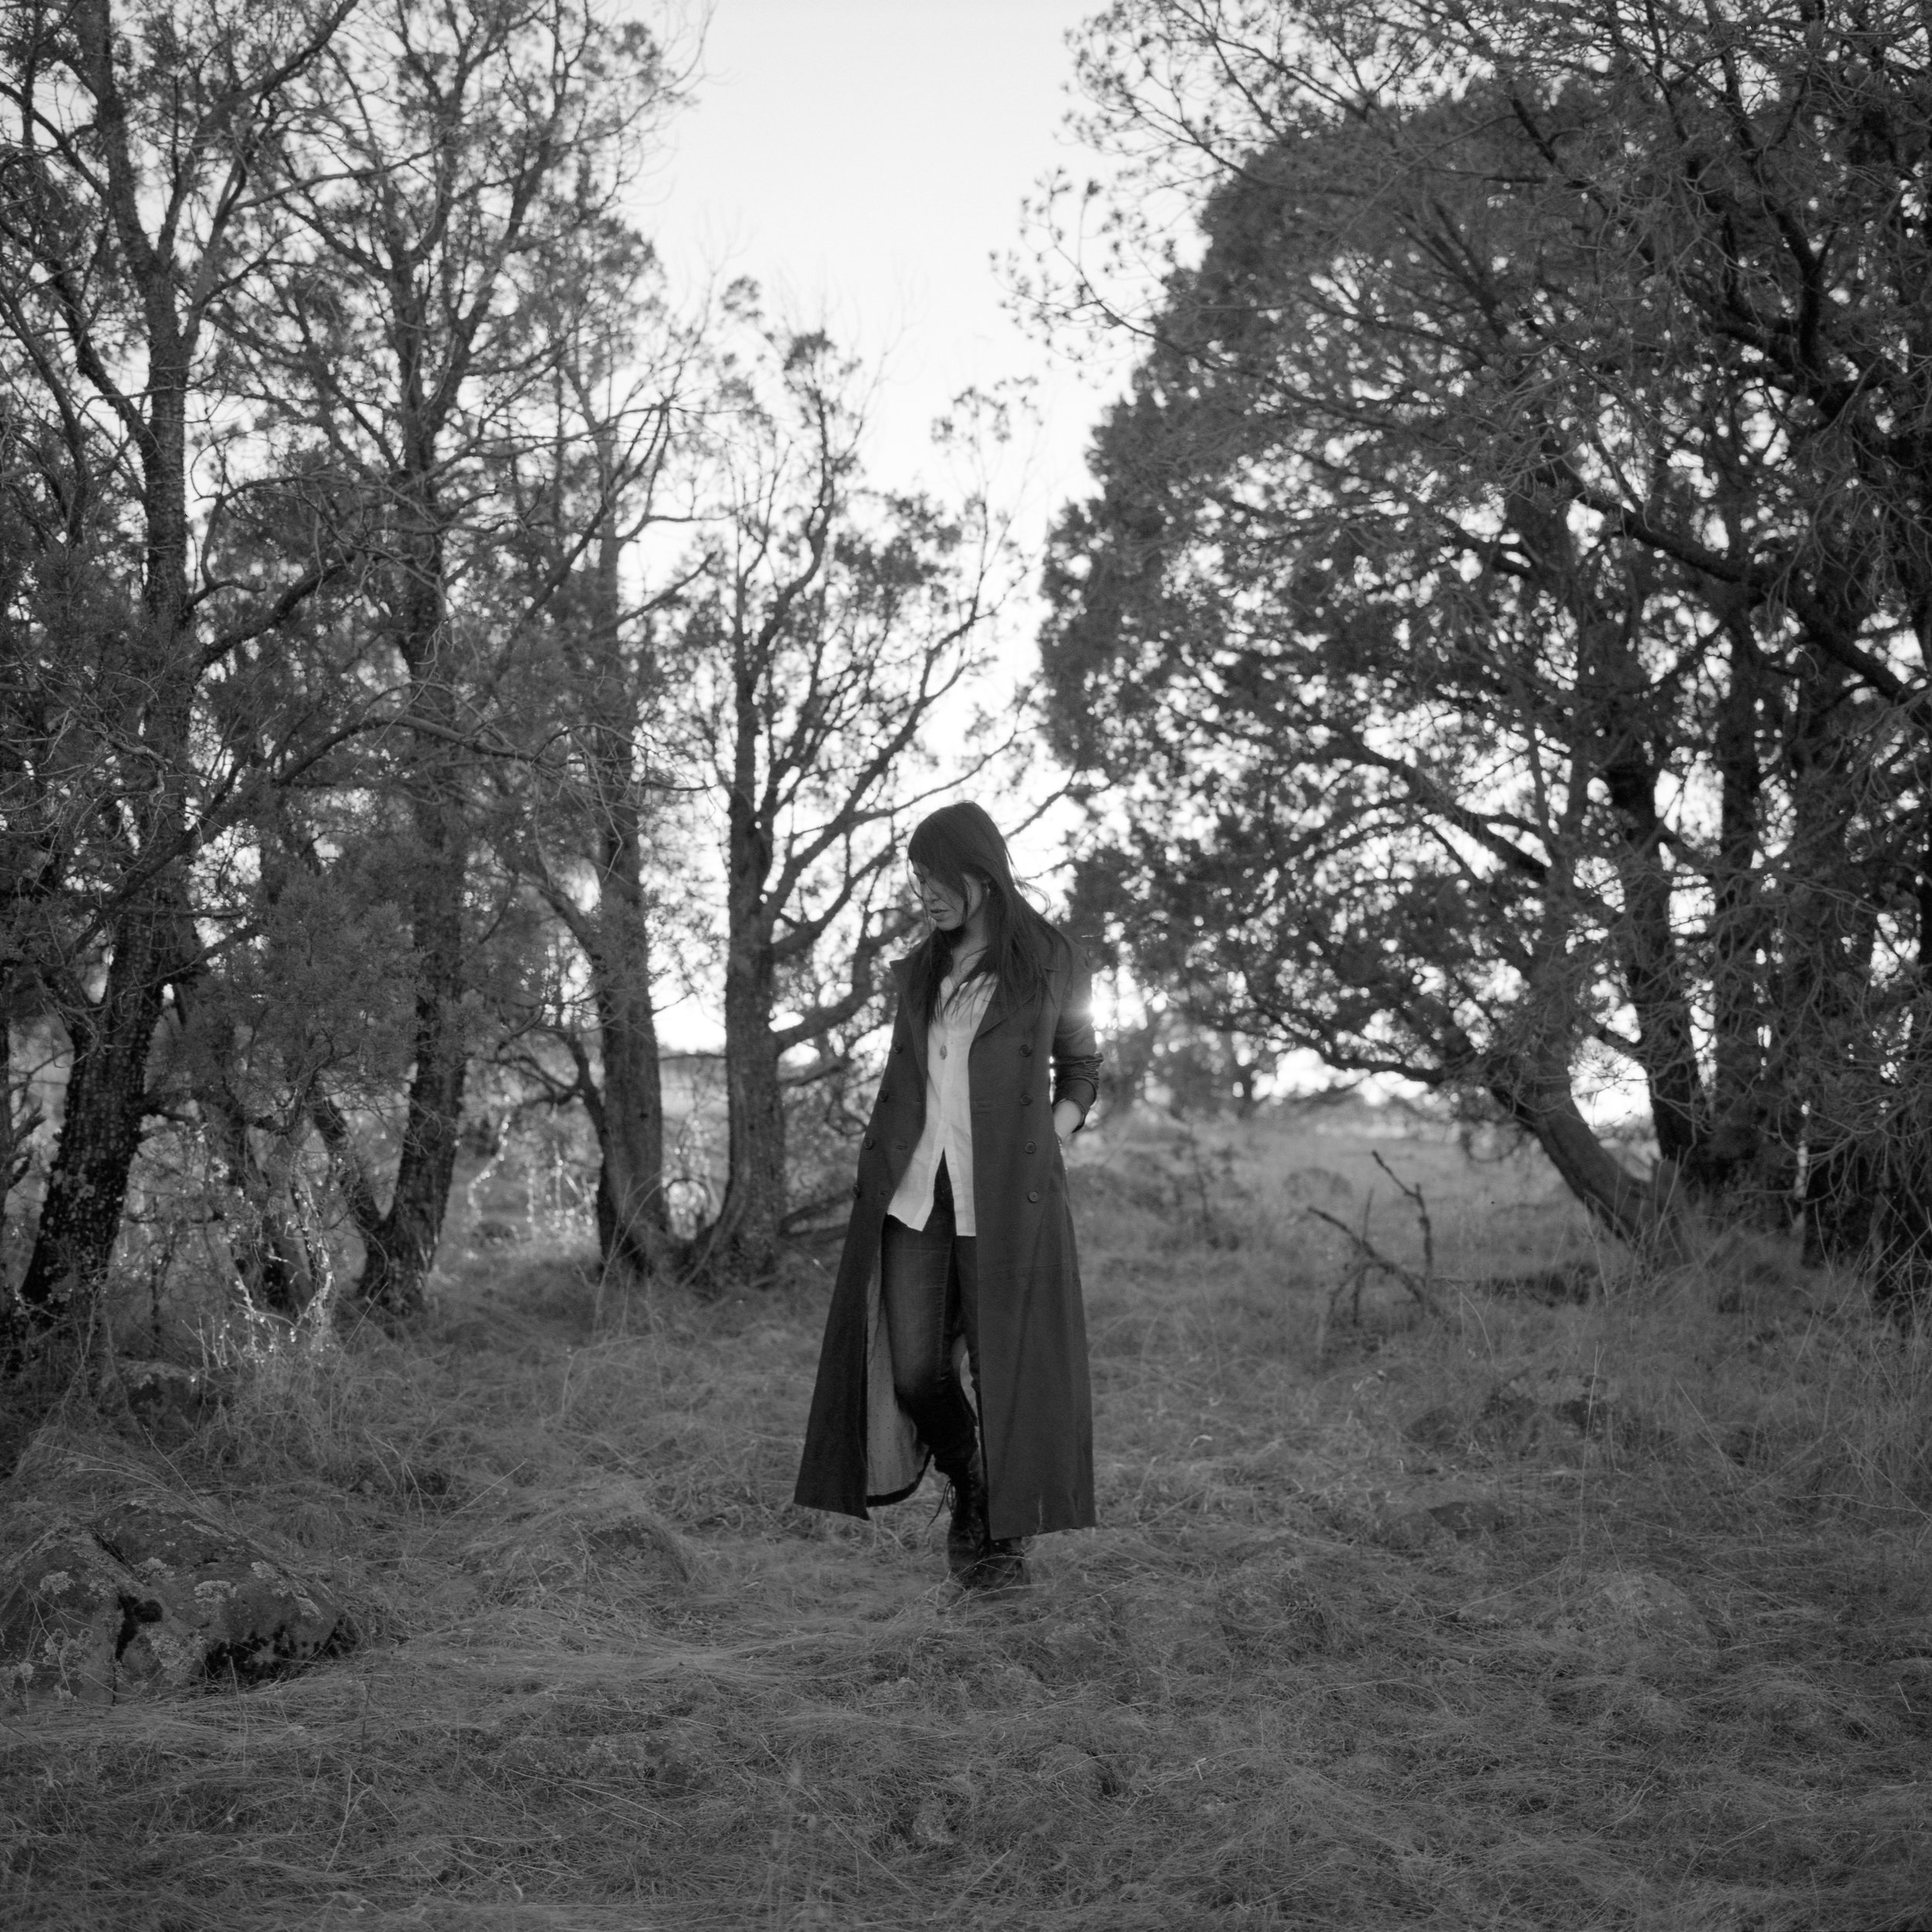 Melaena Cadiz - Los angeles, California